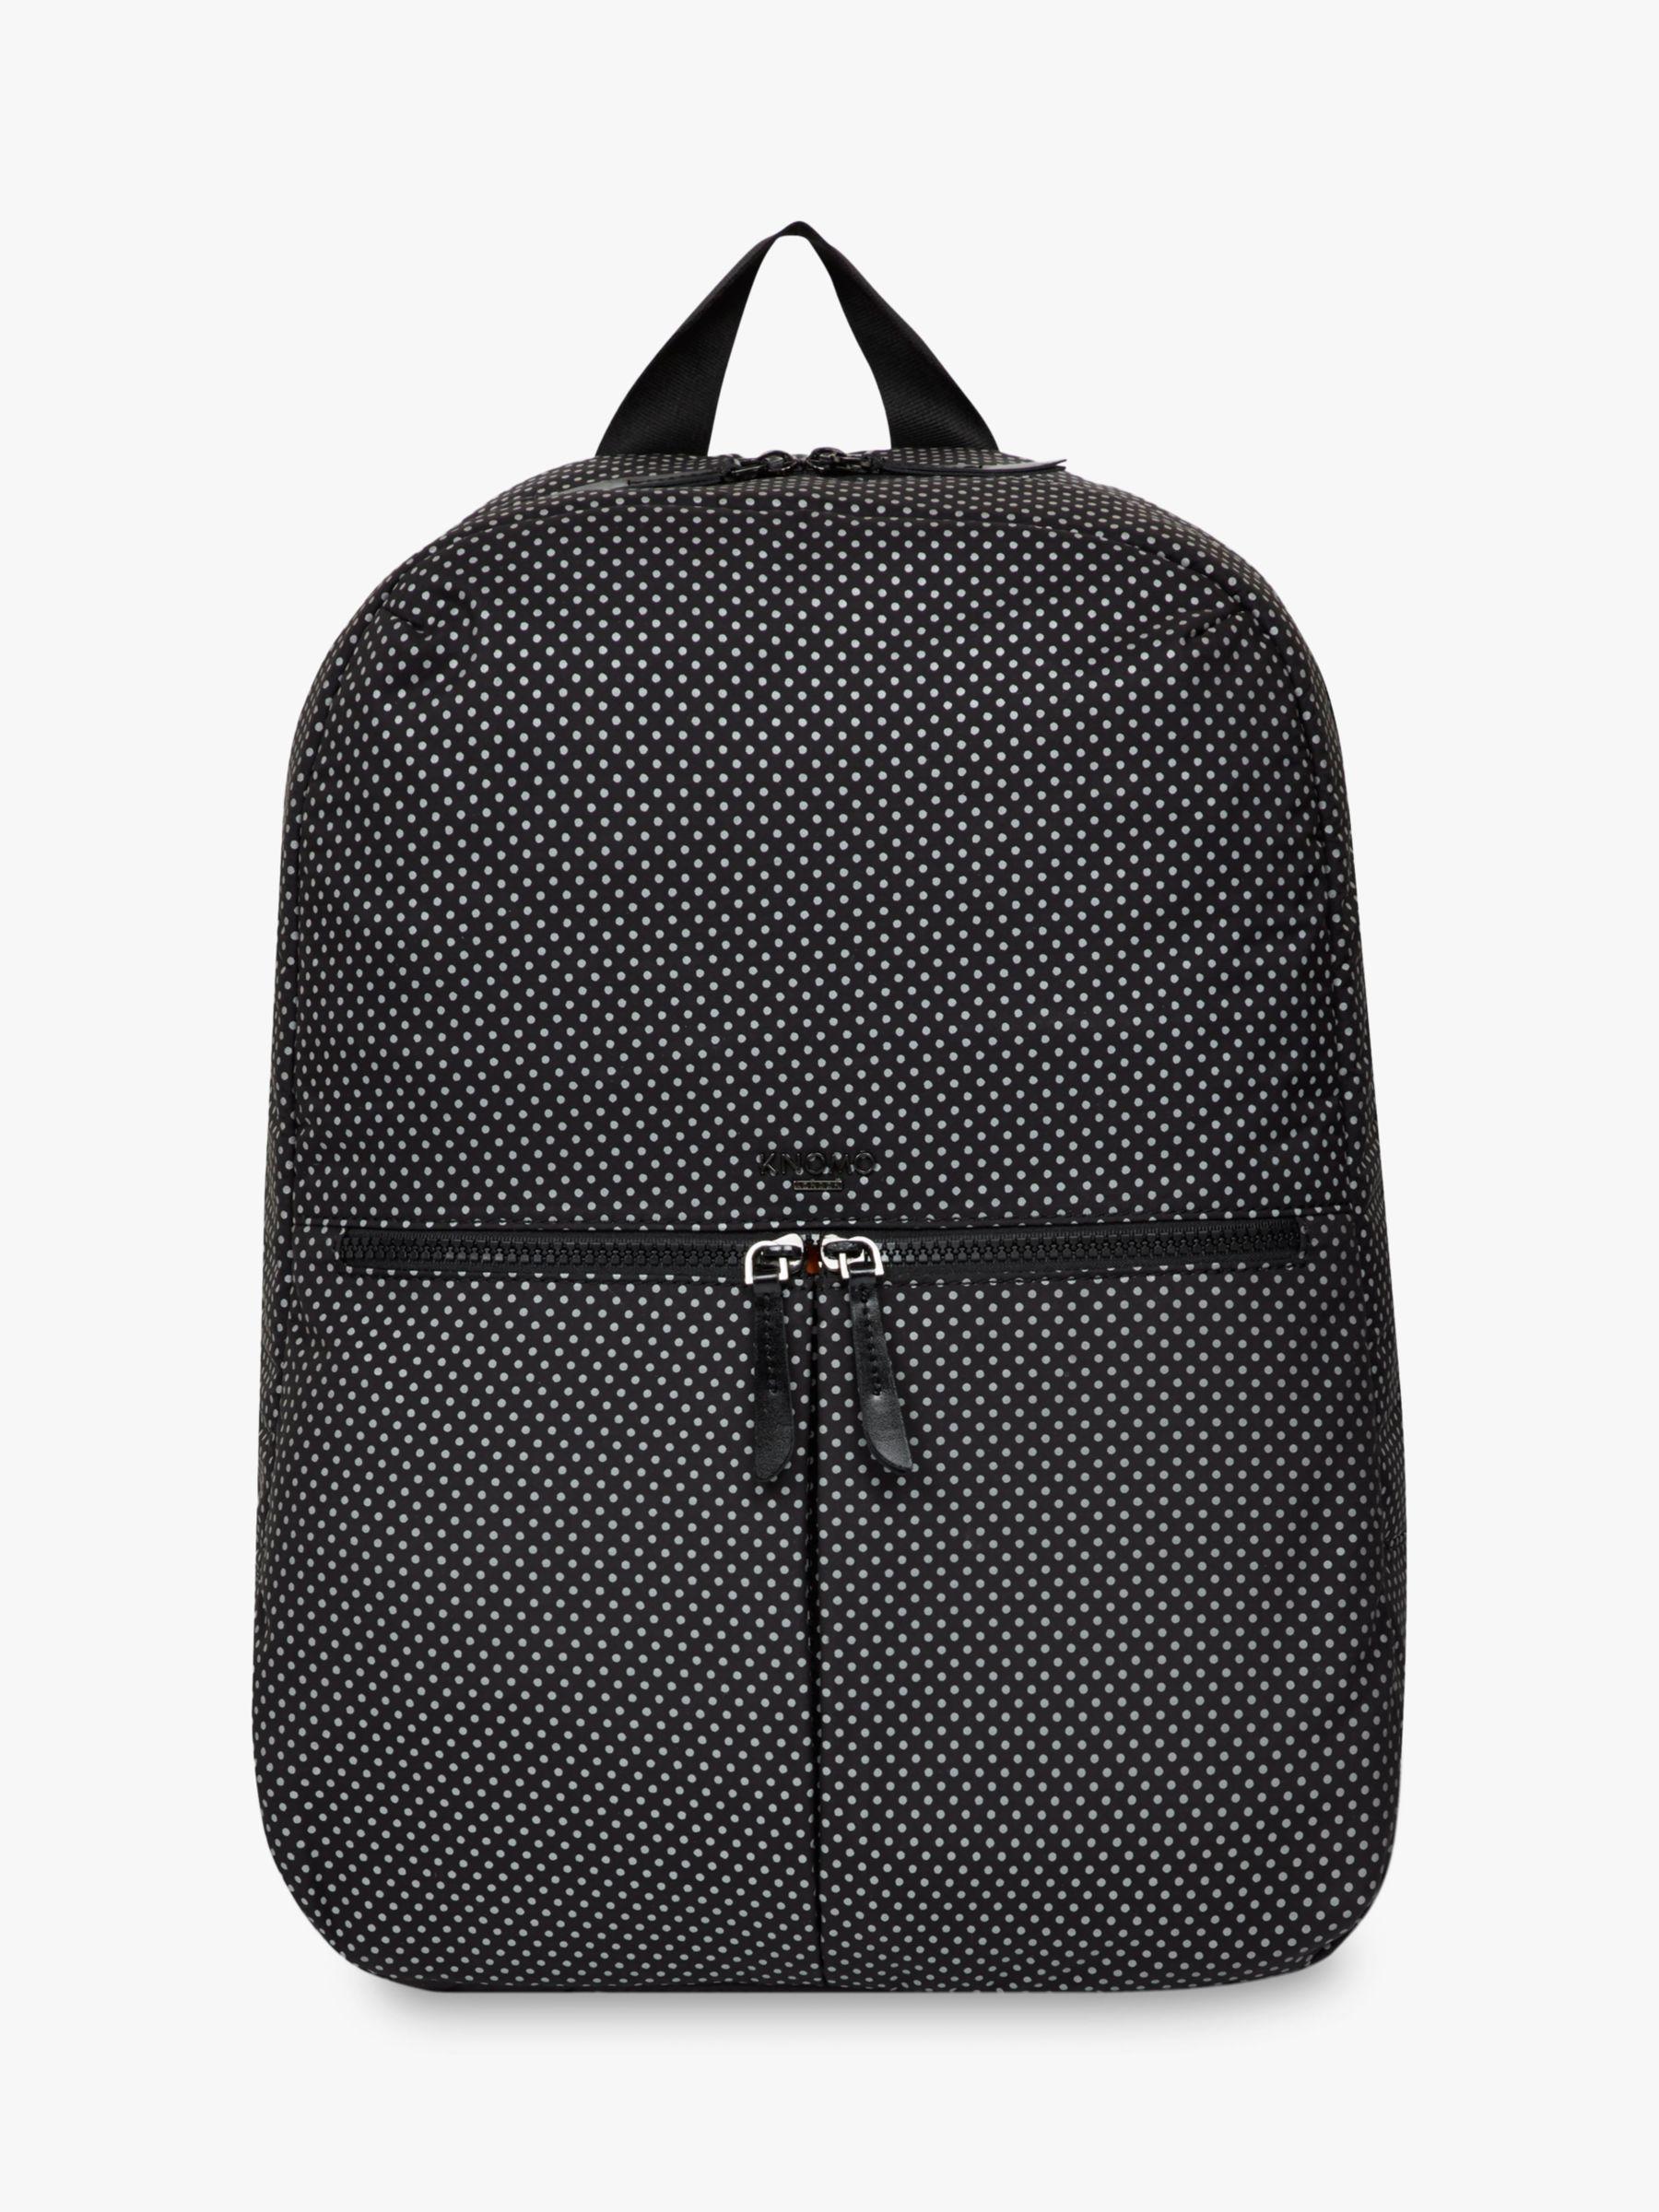 Knomo KNOMO Berlin Backpack for 15 Laptops, Black Reflective